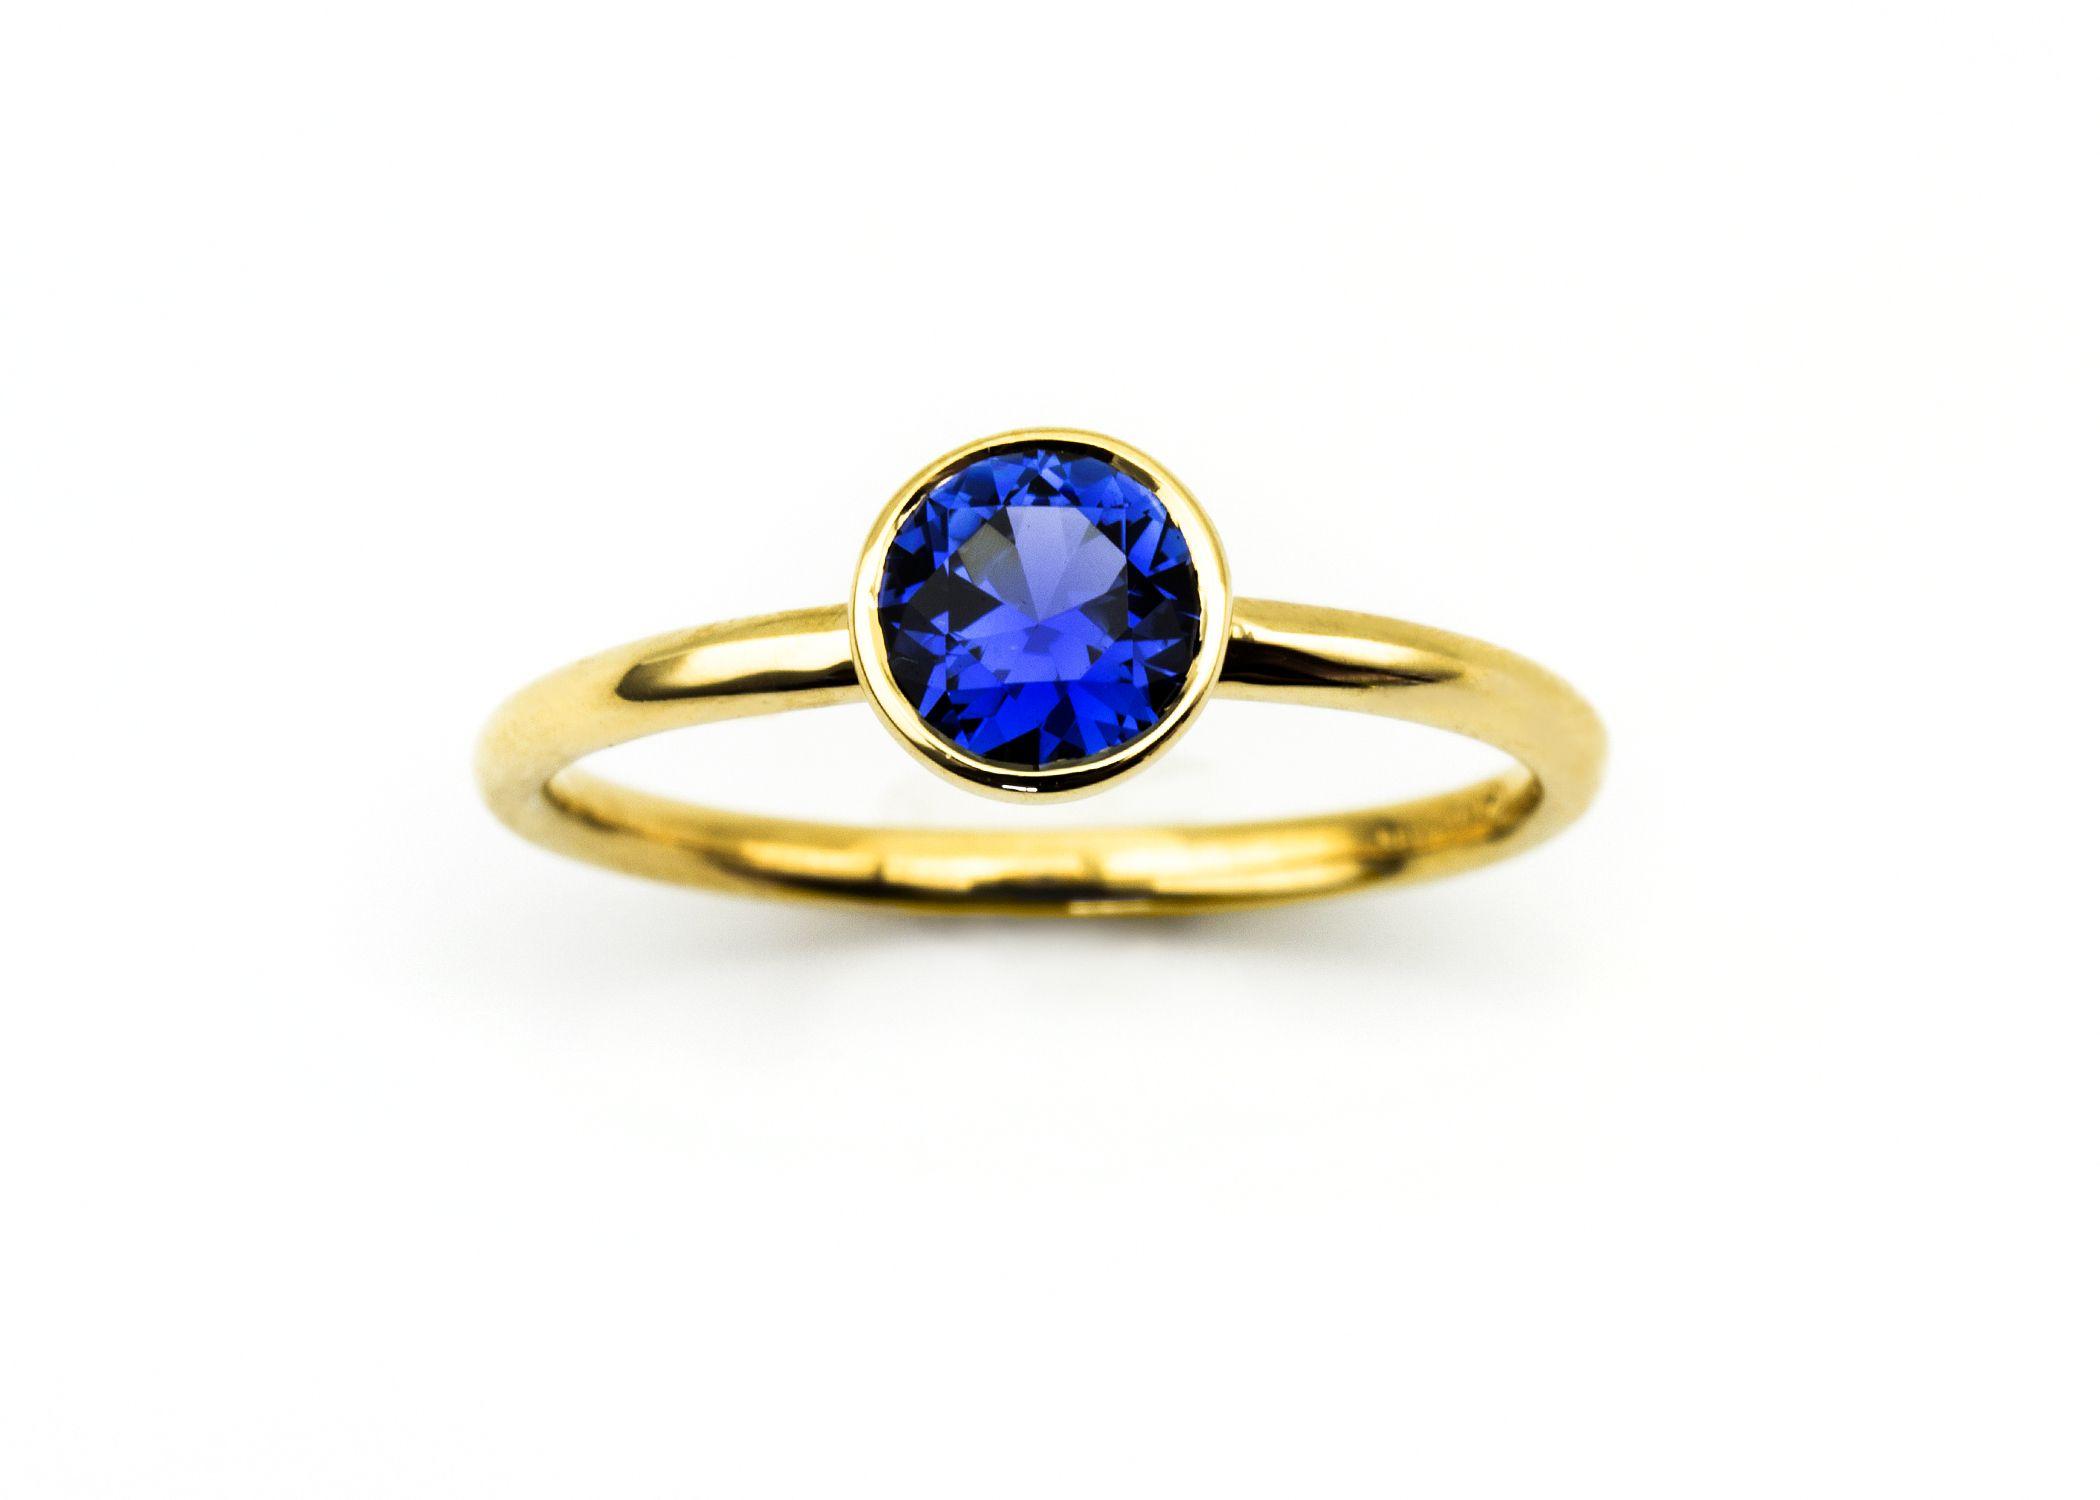 What a stunning Montana Yogo Sapphire ring! #montana #yogo ...